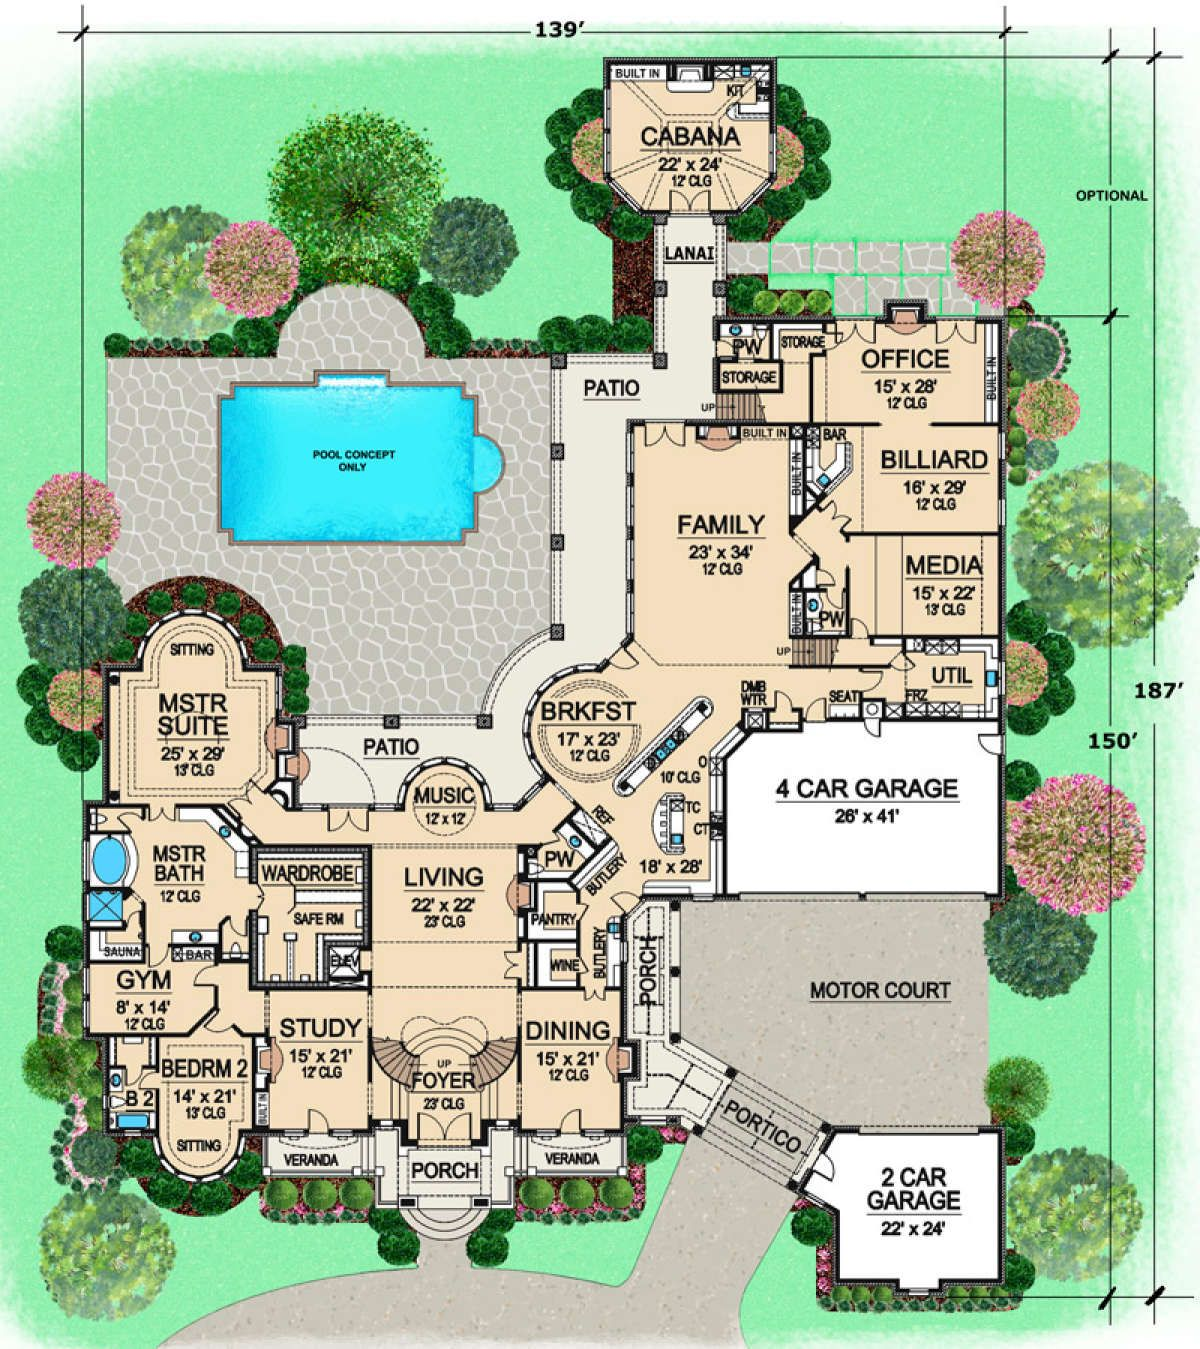 House Plan 5445 00080 European Plan 15 079 Square Feet 7 Bedrooms 9 Bathrooms Large House Plans European Plan Luxury Floor Plans